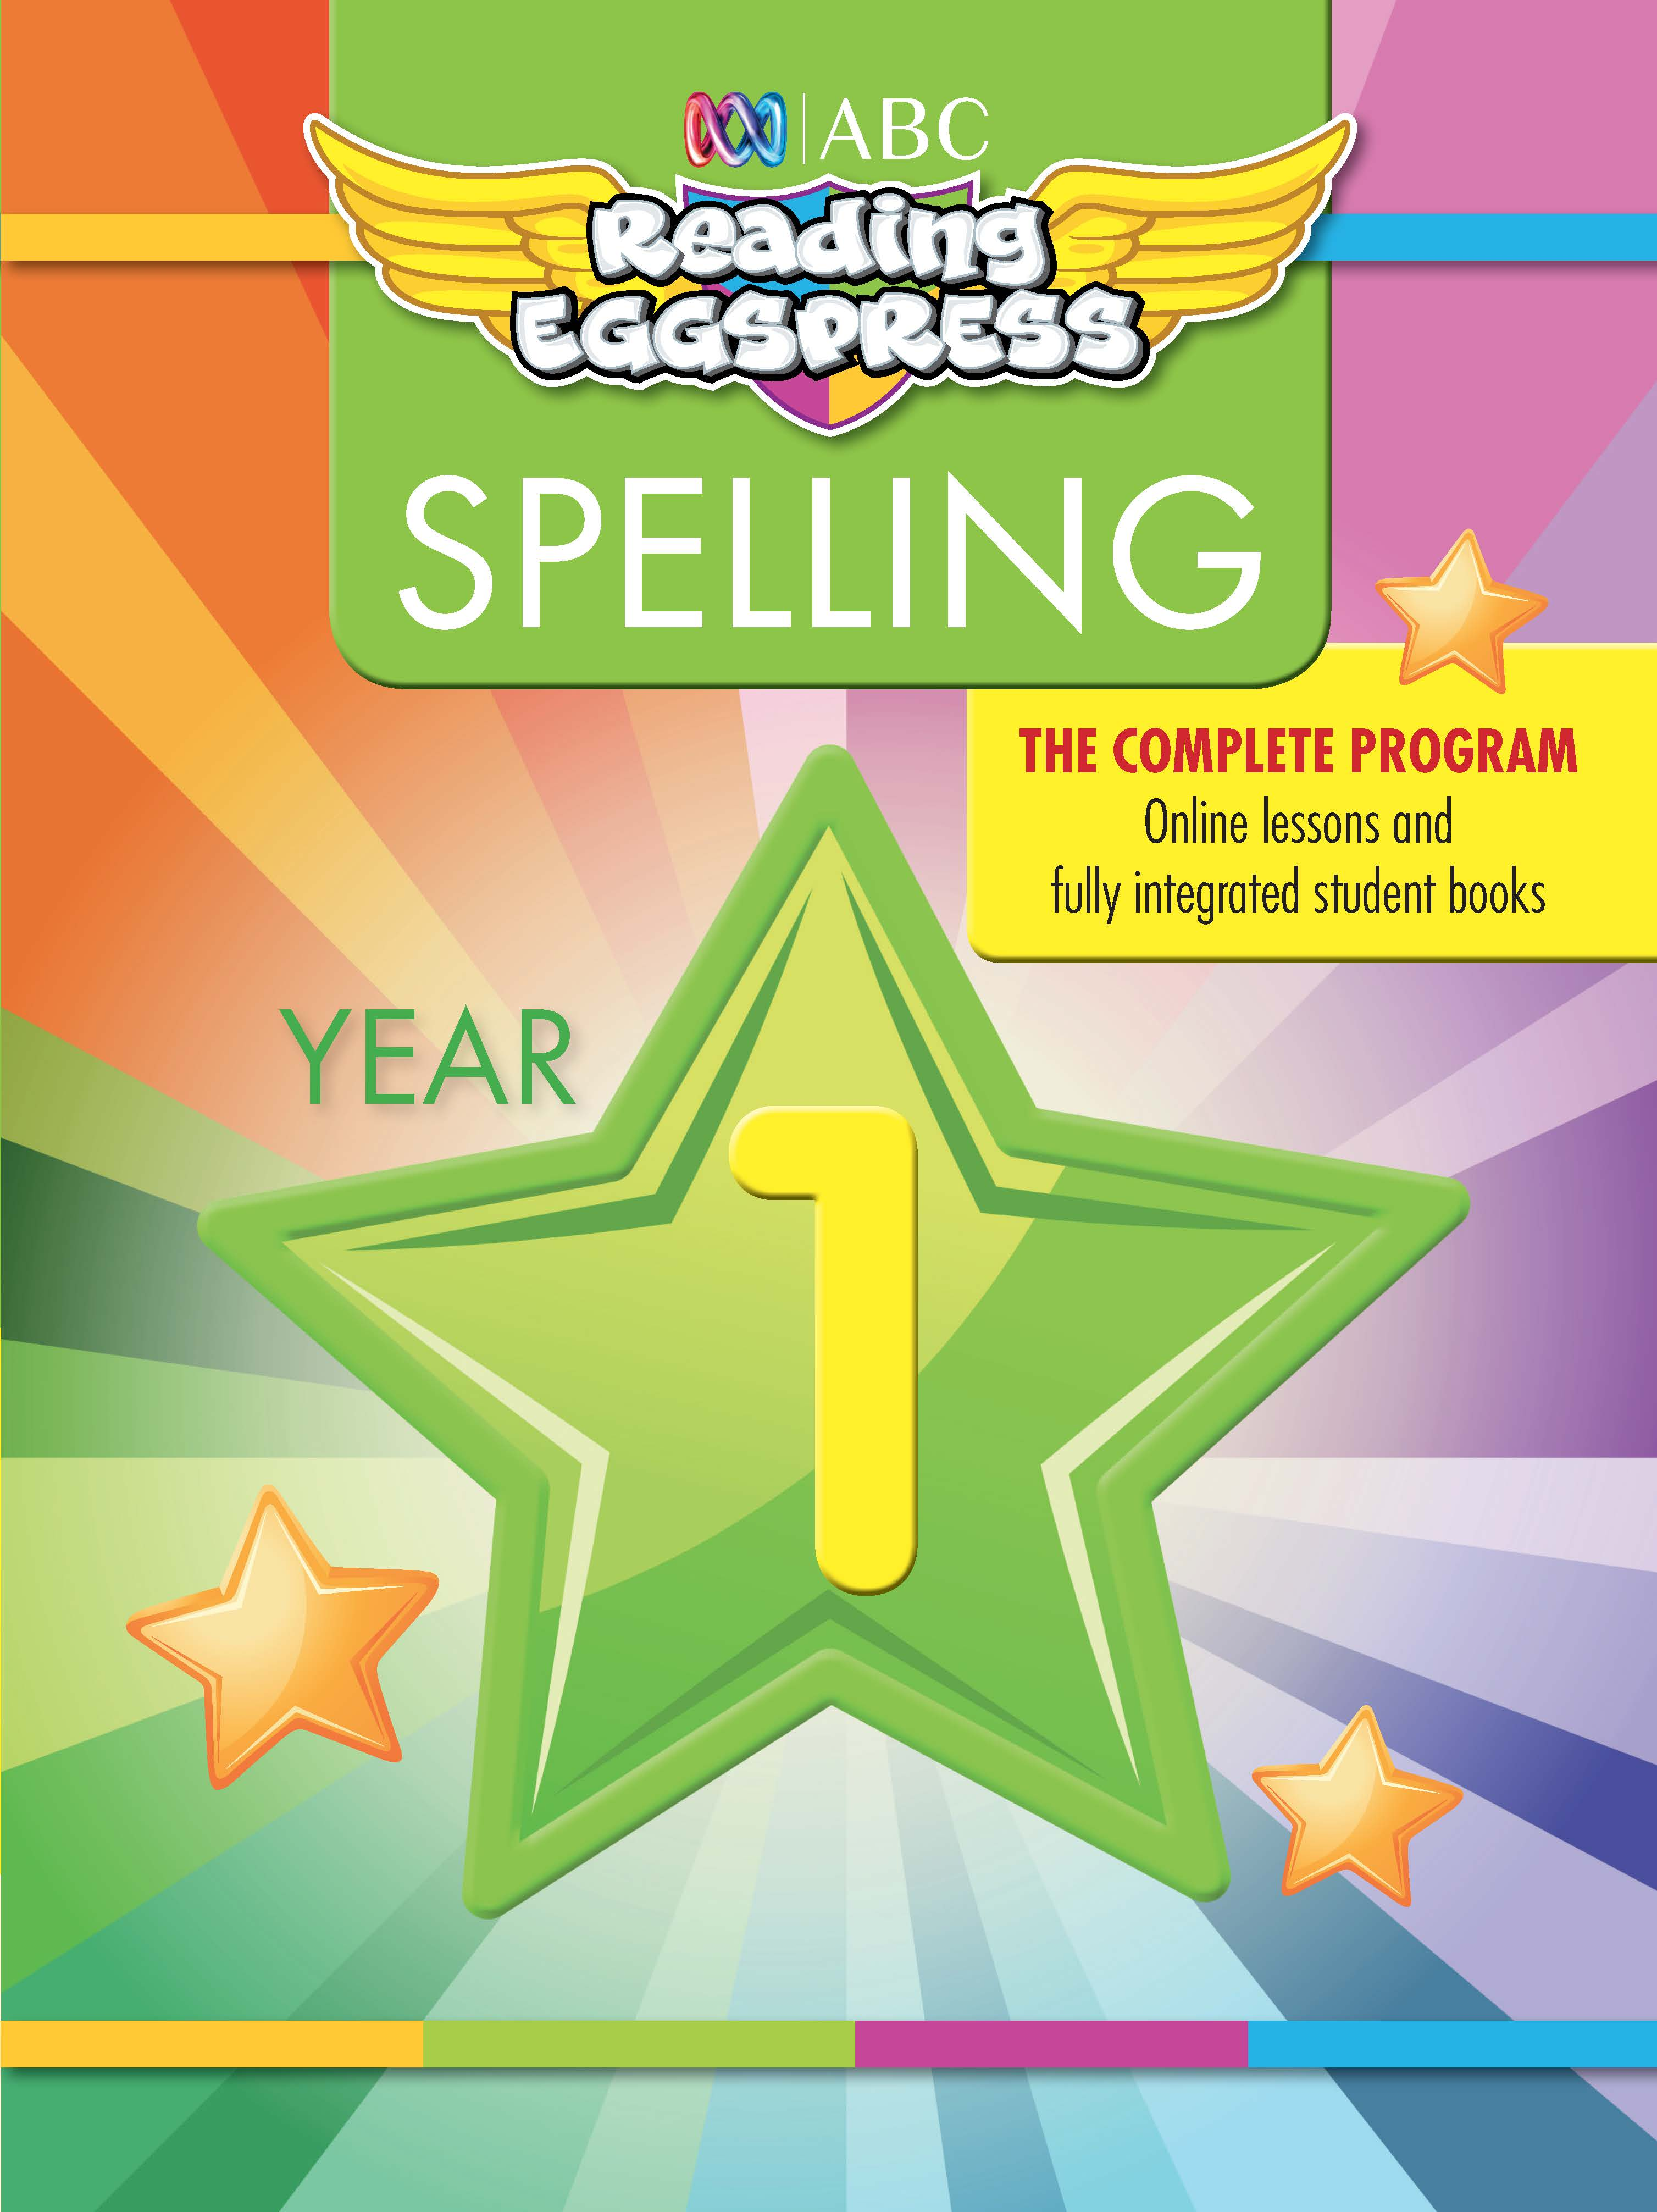 ABC Reading Eggspress Spelling Workbook Year 1